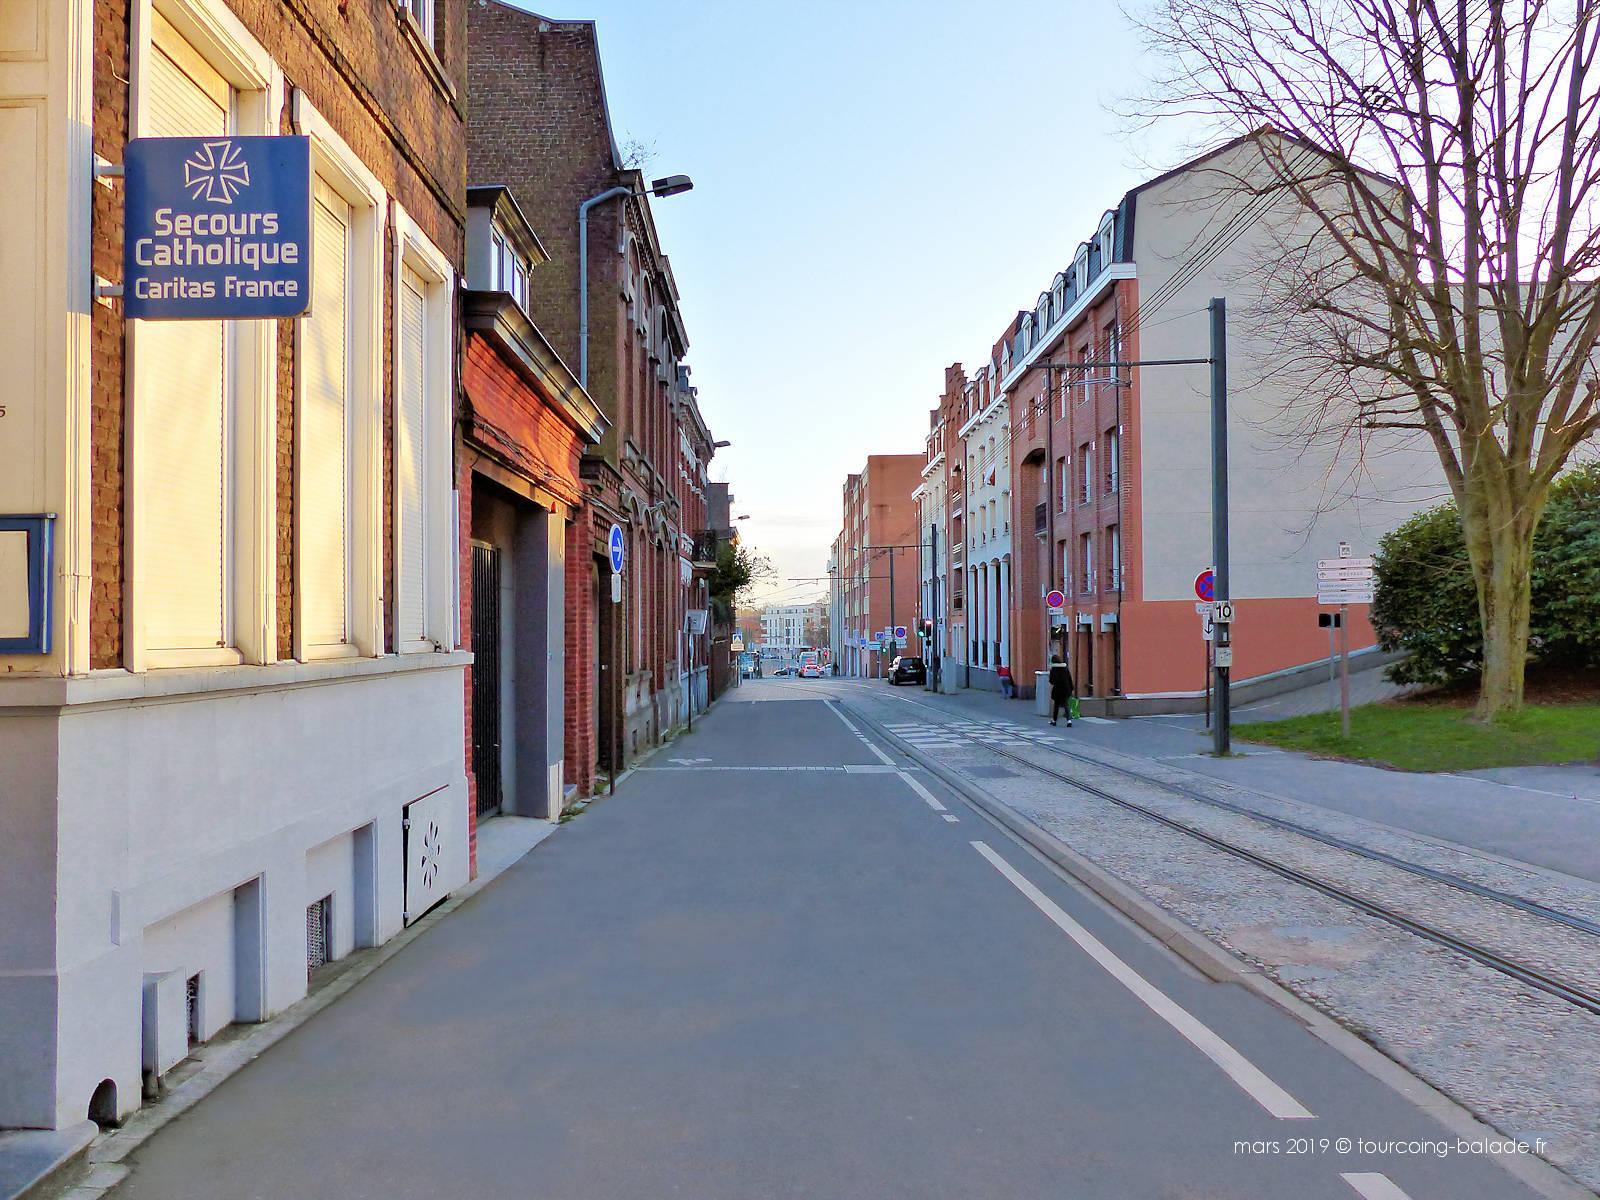 Secours Catholique - Tourcoing, 35 Rue Chanzy.